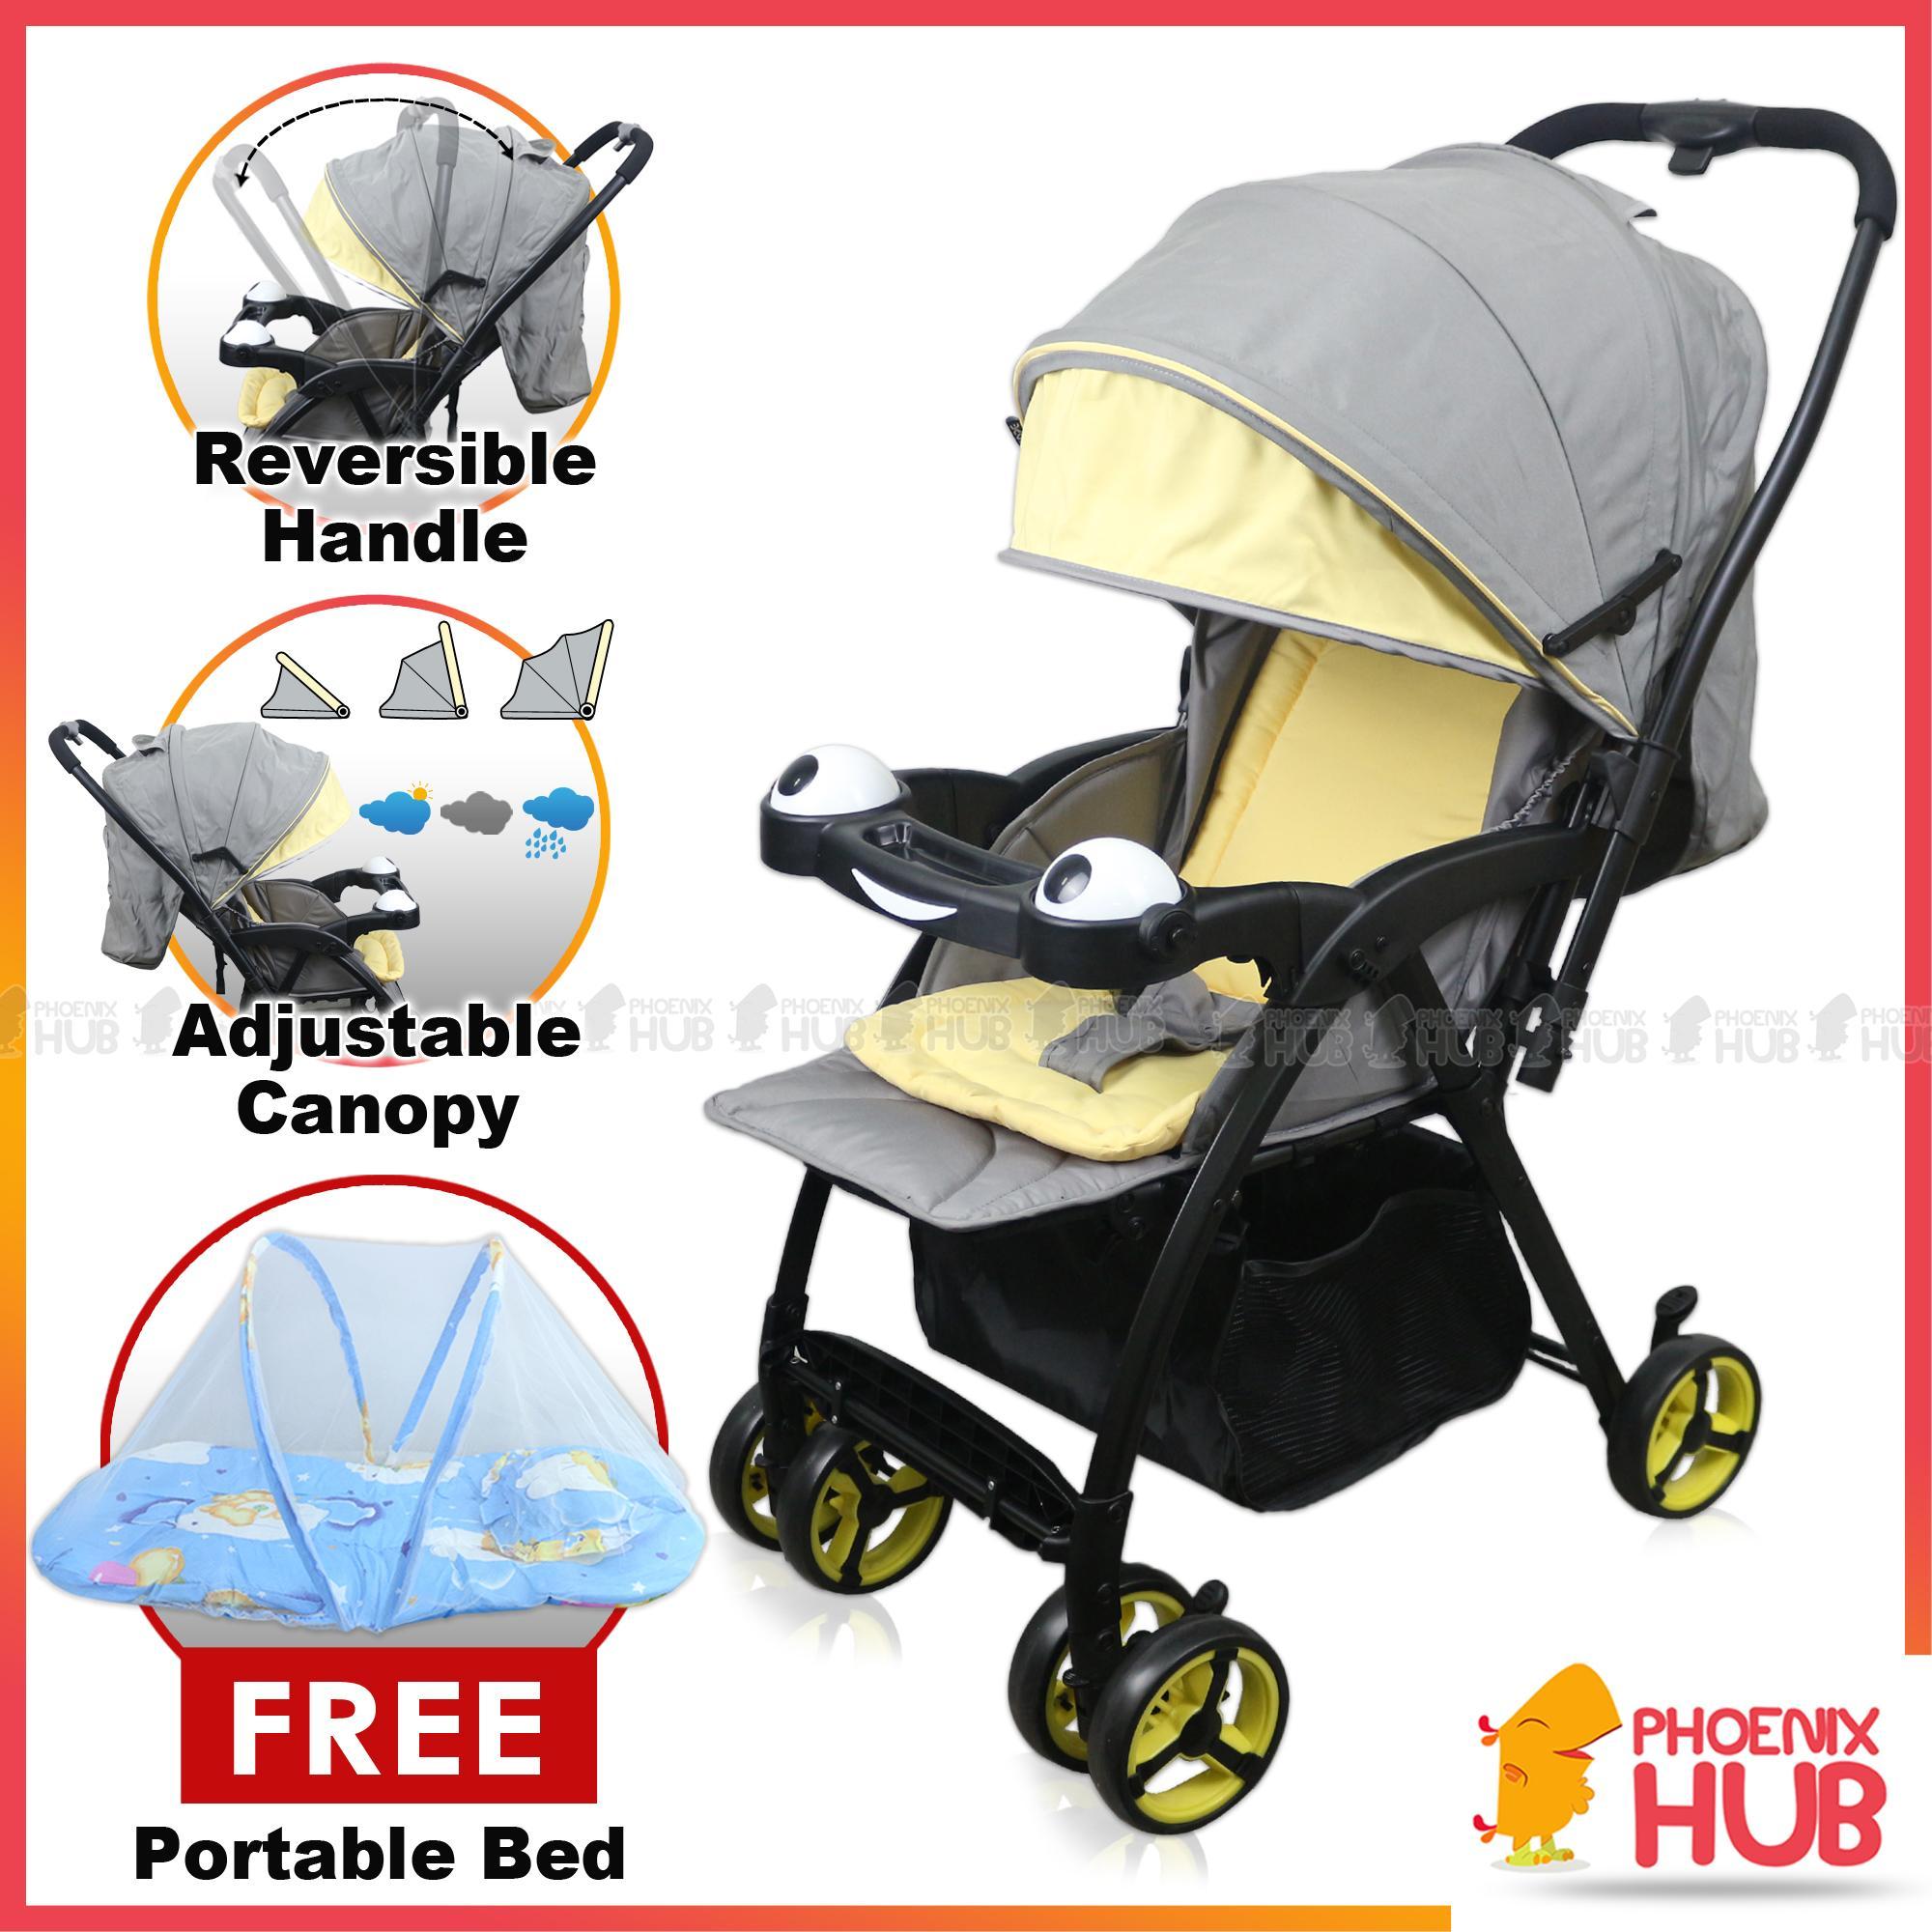 7e7d110e02 Phoenix Hub Baby Stroller Travel System HP-712 Pocket Stroller Pockit  Pushchair Food Tray High